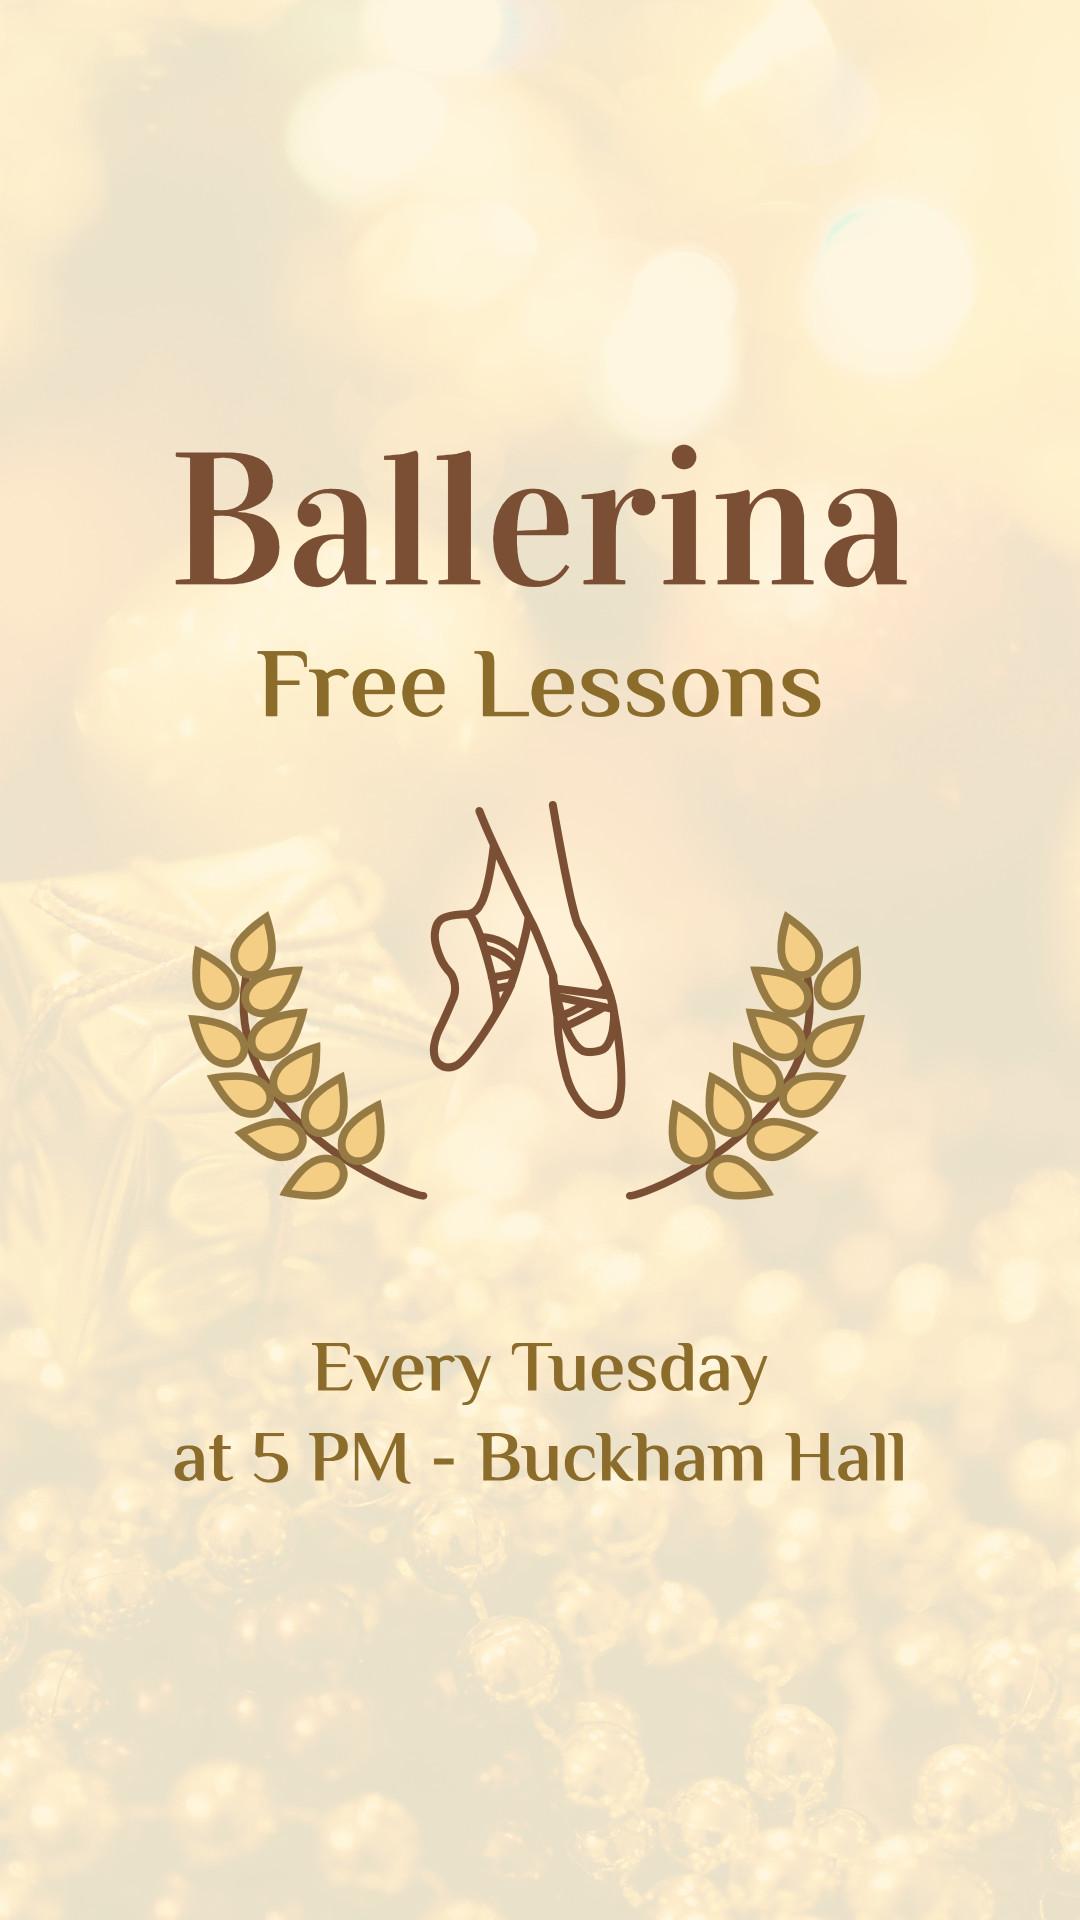 Ballerina free lessons